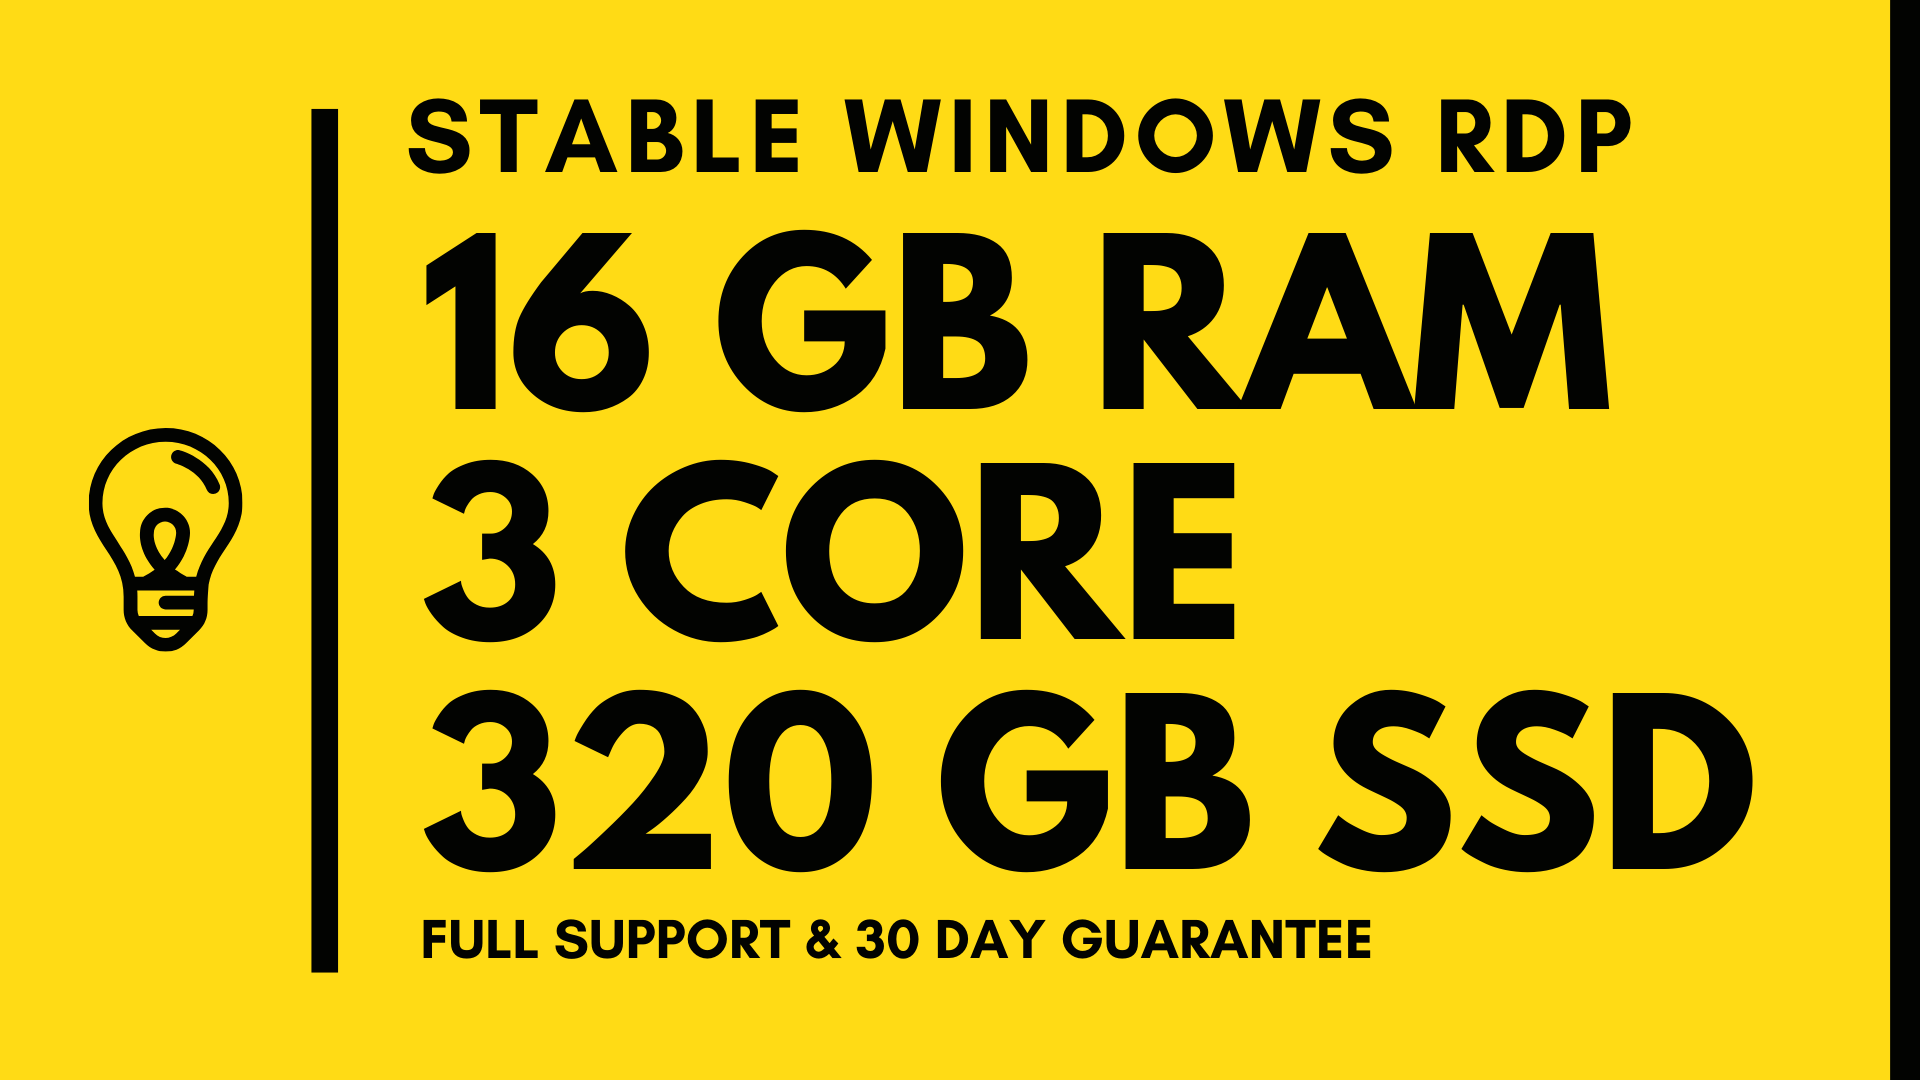 Windows VPS RDP 16GB RAM 3CORE 320GB SSD